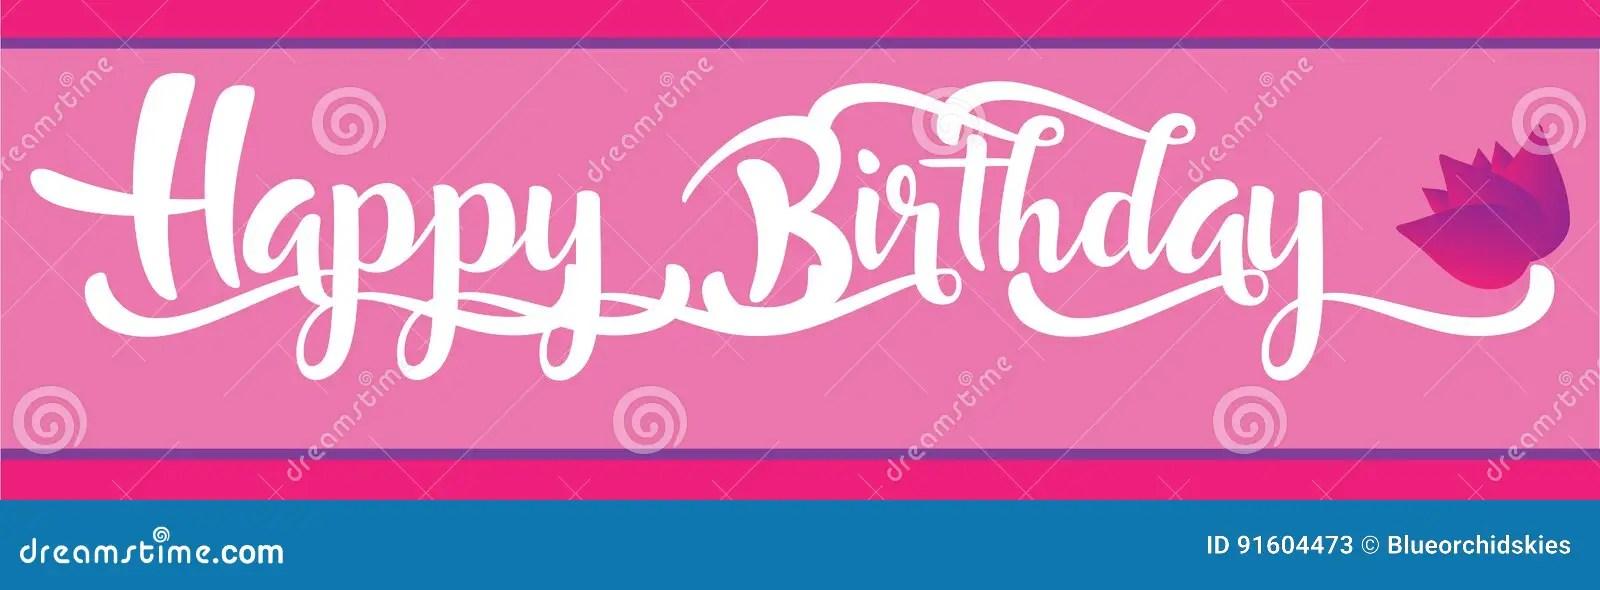 Happy Birthday Banner For Girl Stock Illustration Illustration Of Clip Happy 91604473